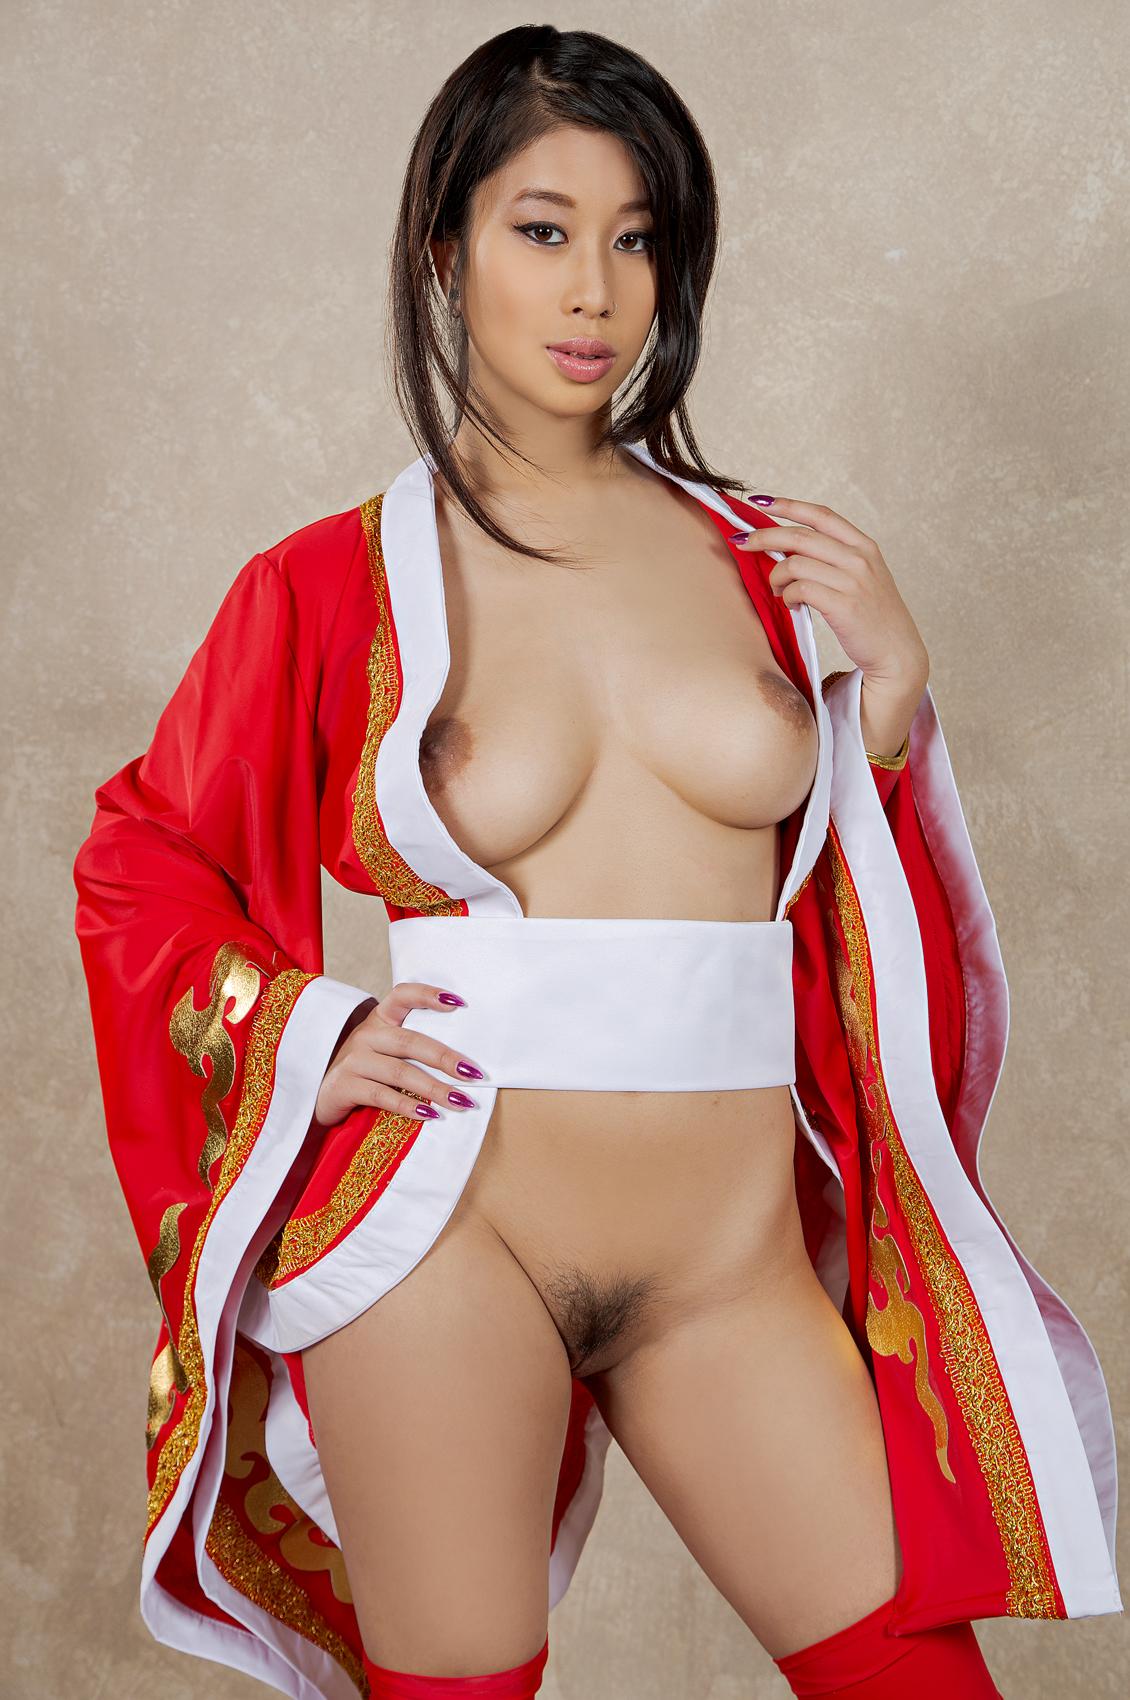 Jade Kush's Bio, Free Nude Pics & VR Porn Videos